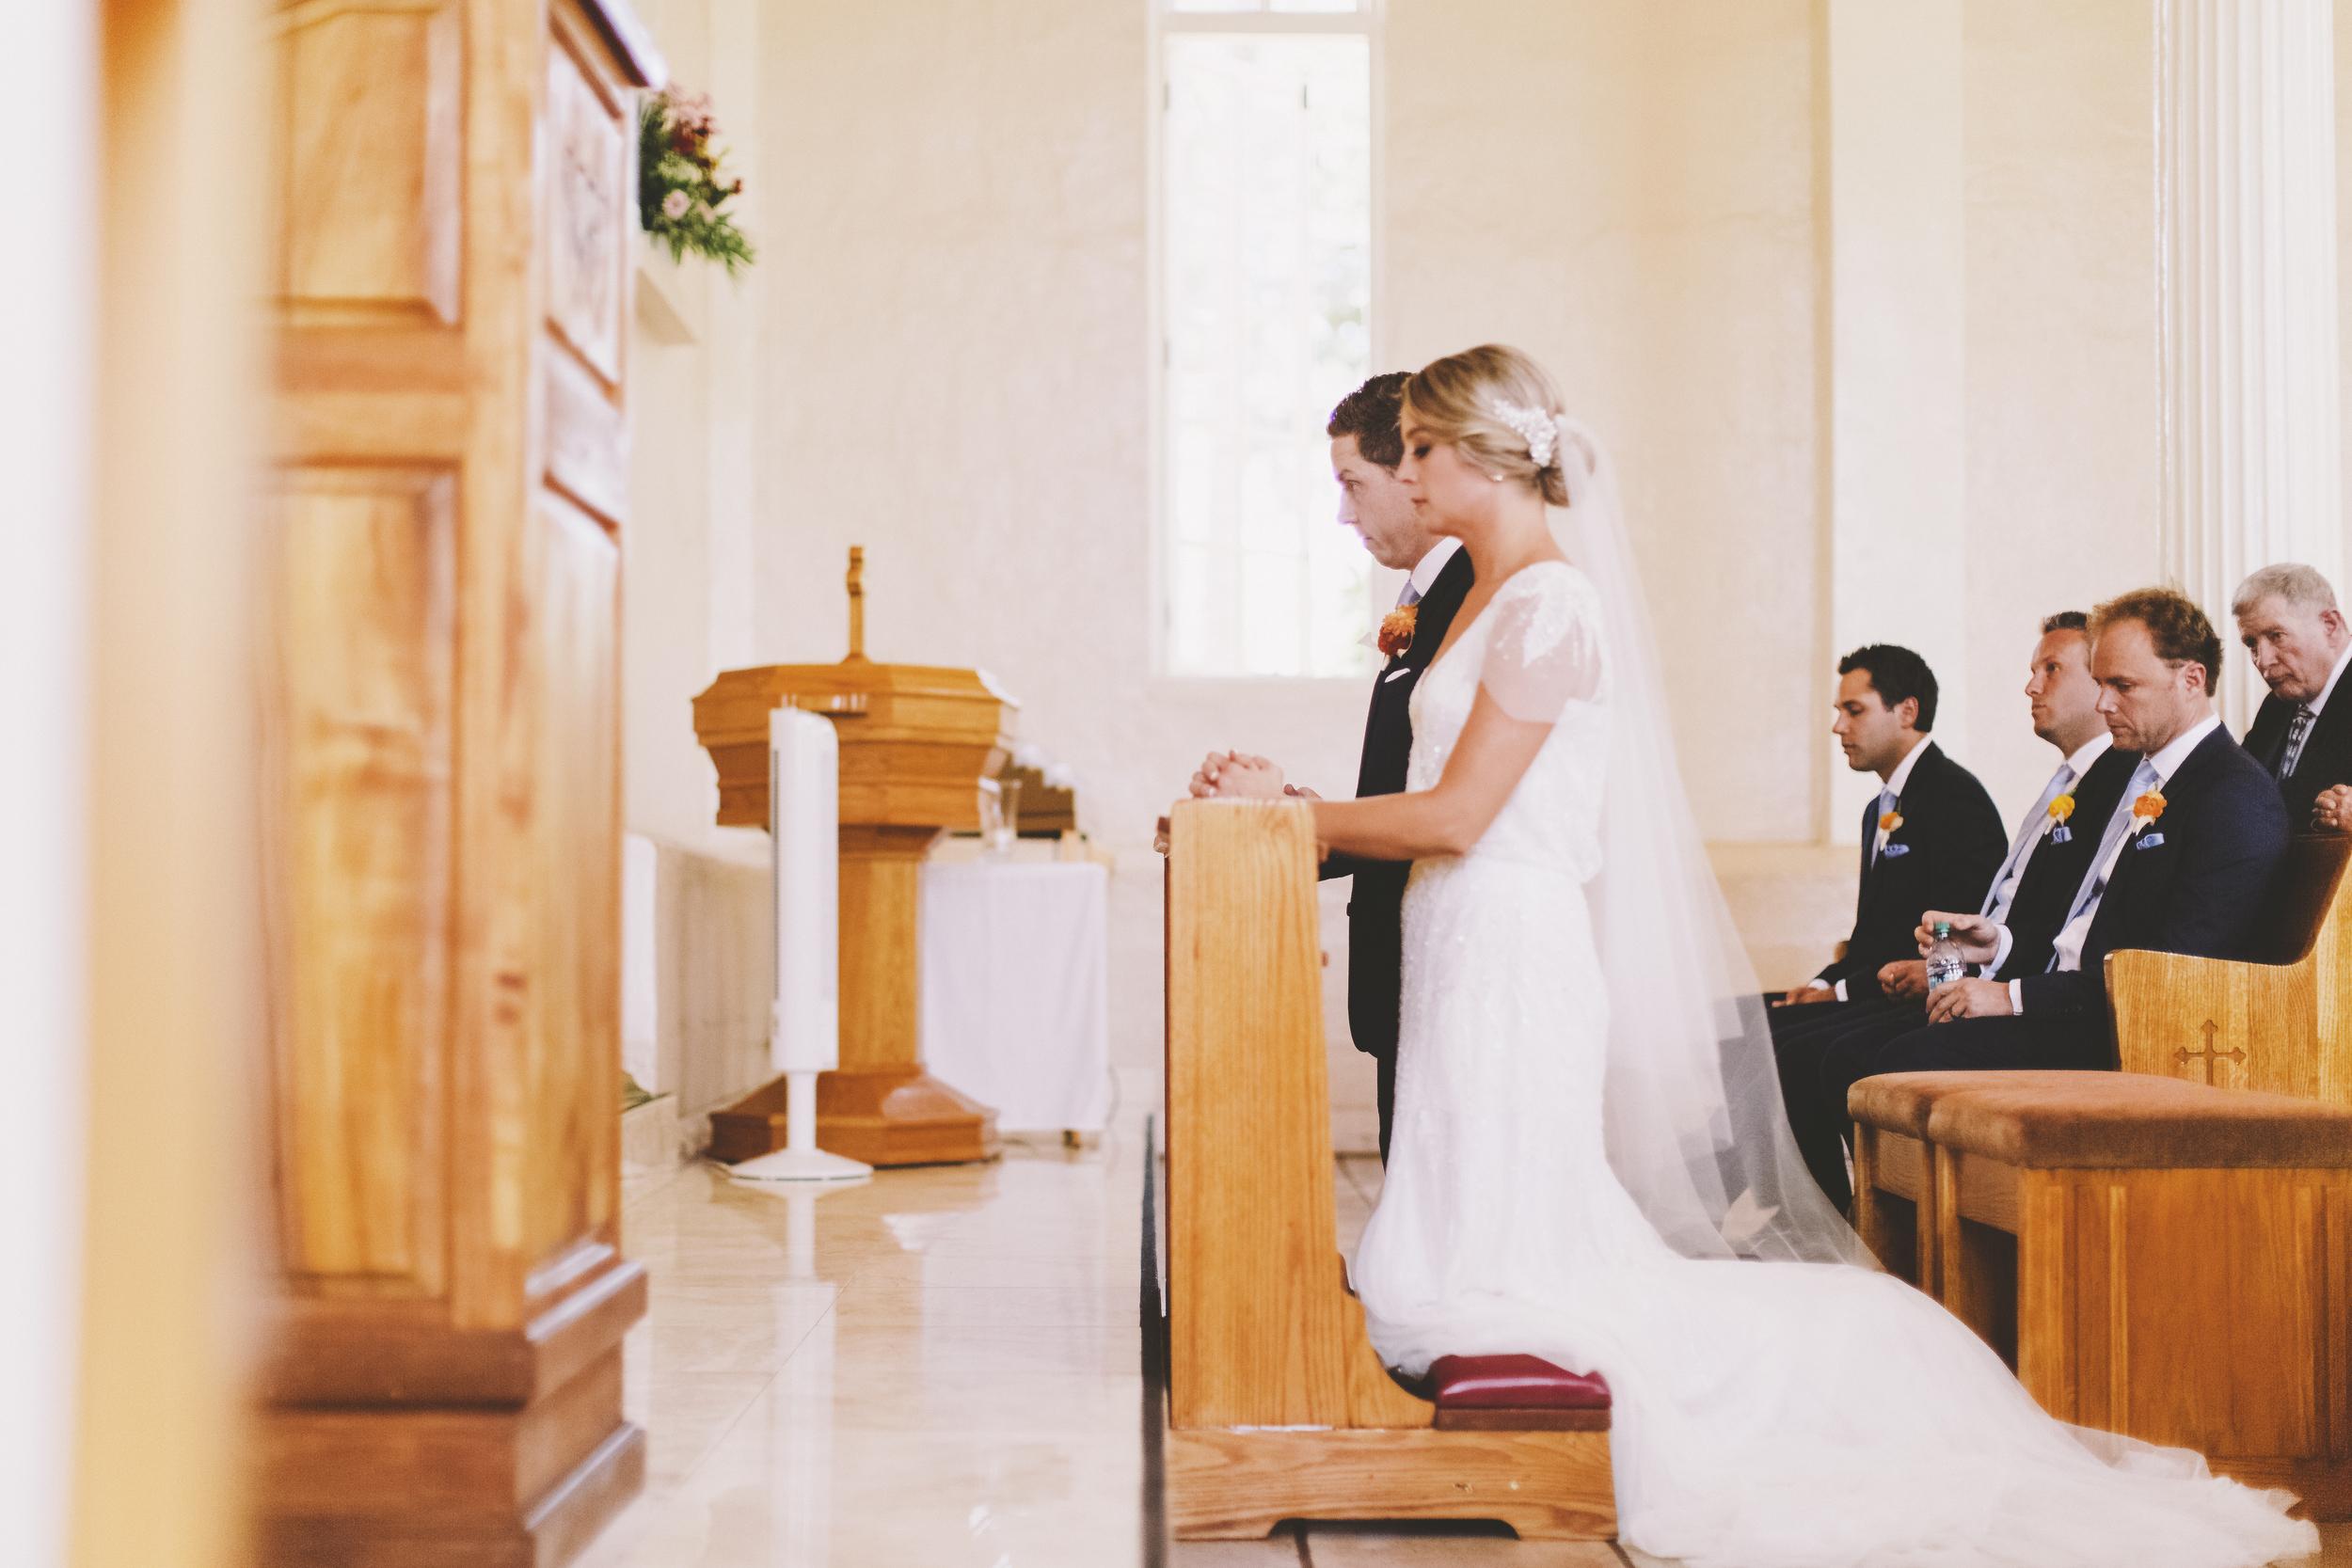 angie-diaz-photography-maui-wedding-mel-matt-38.jpeg